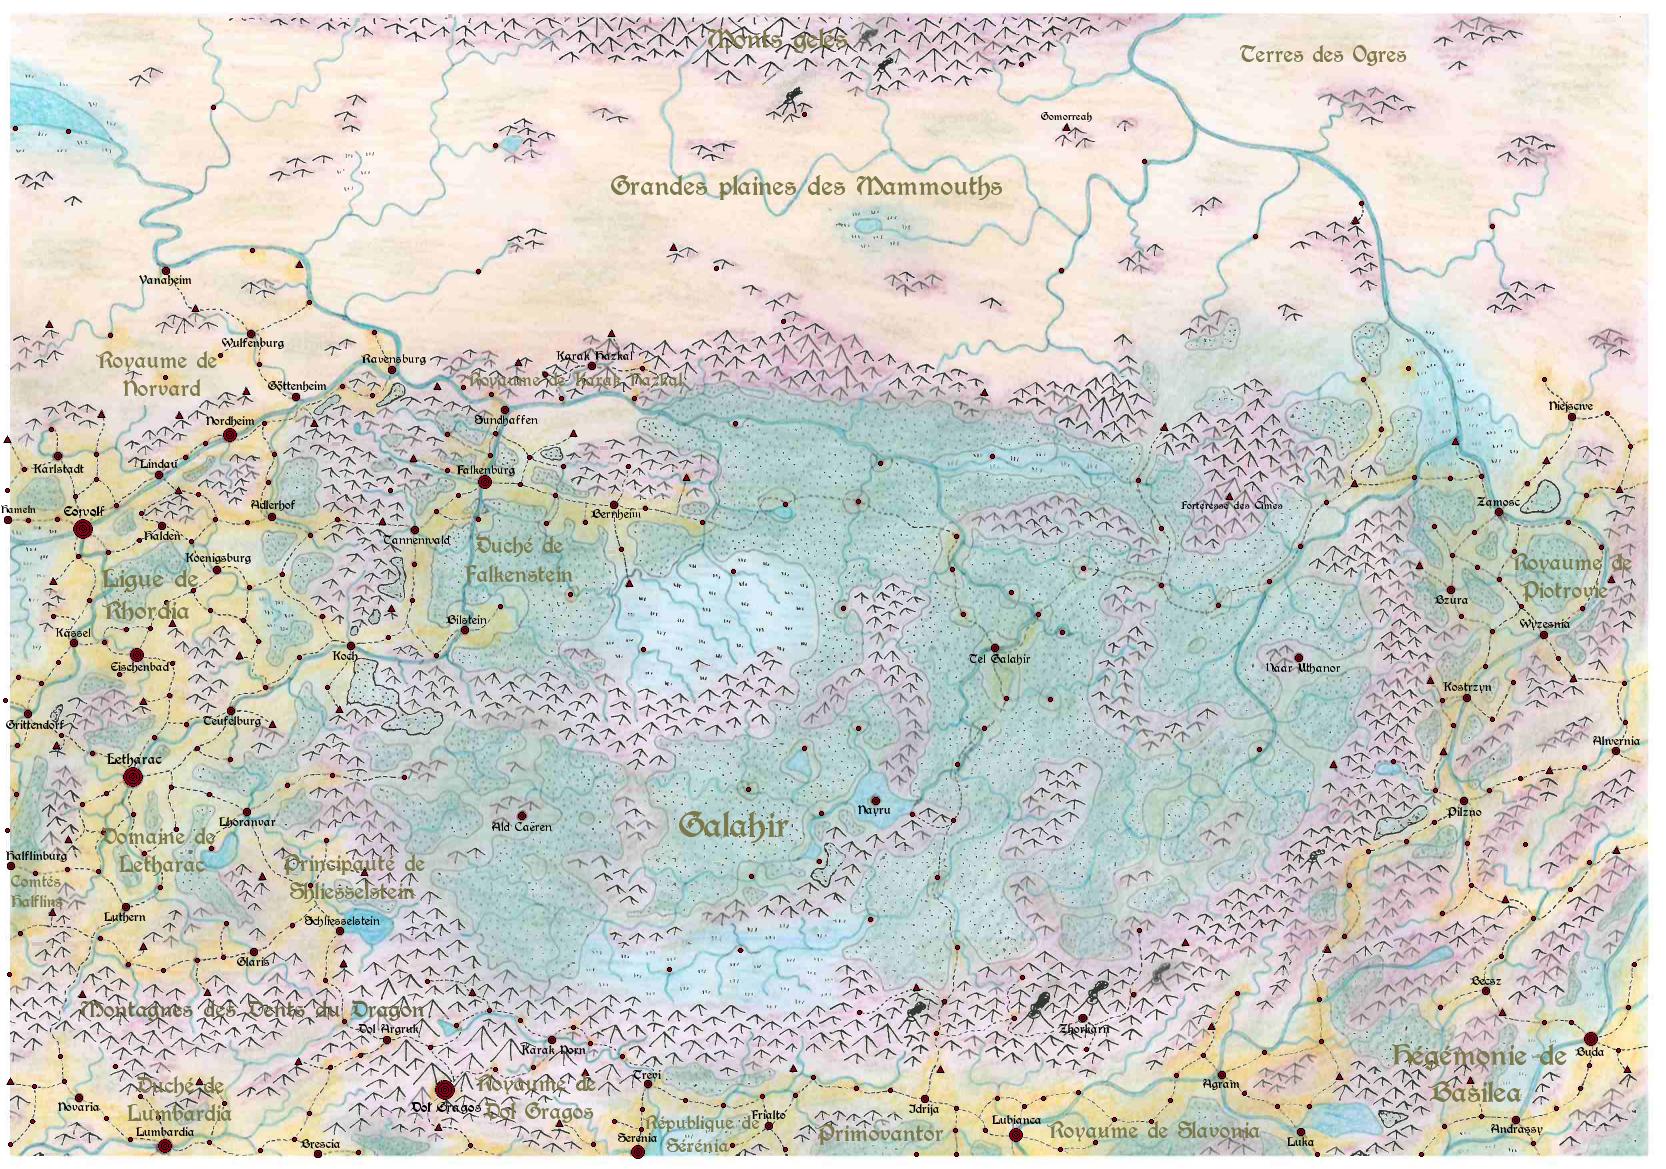 Kings of War : Carte de Galahir et alentours 182295CarteManticaNomme